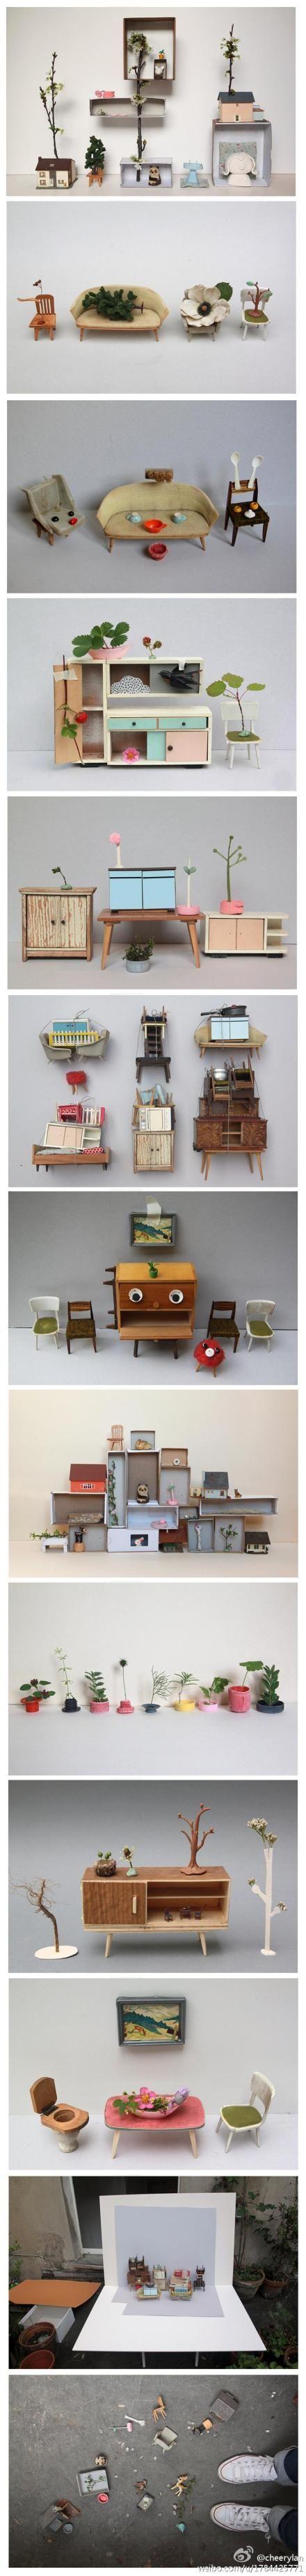 super sweet dollhouse furniture